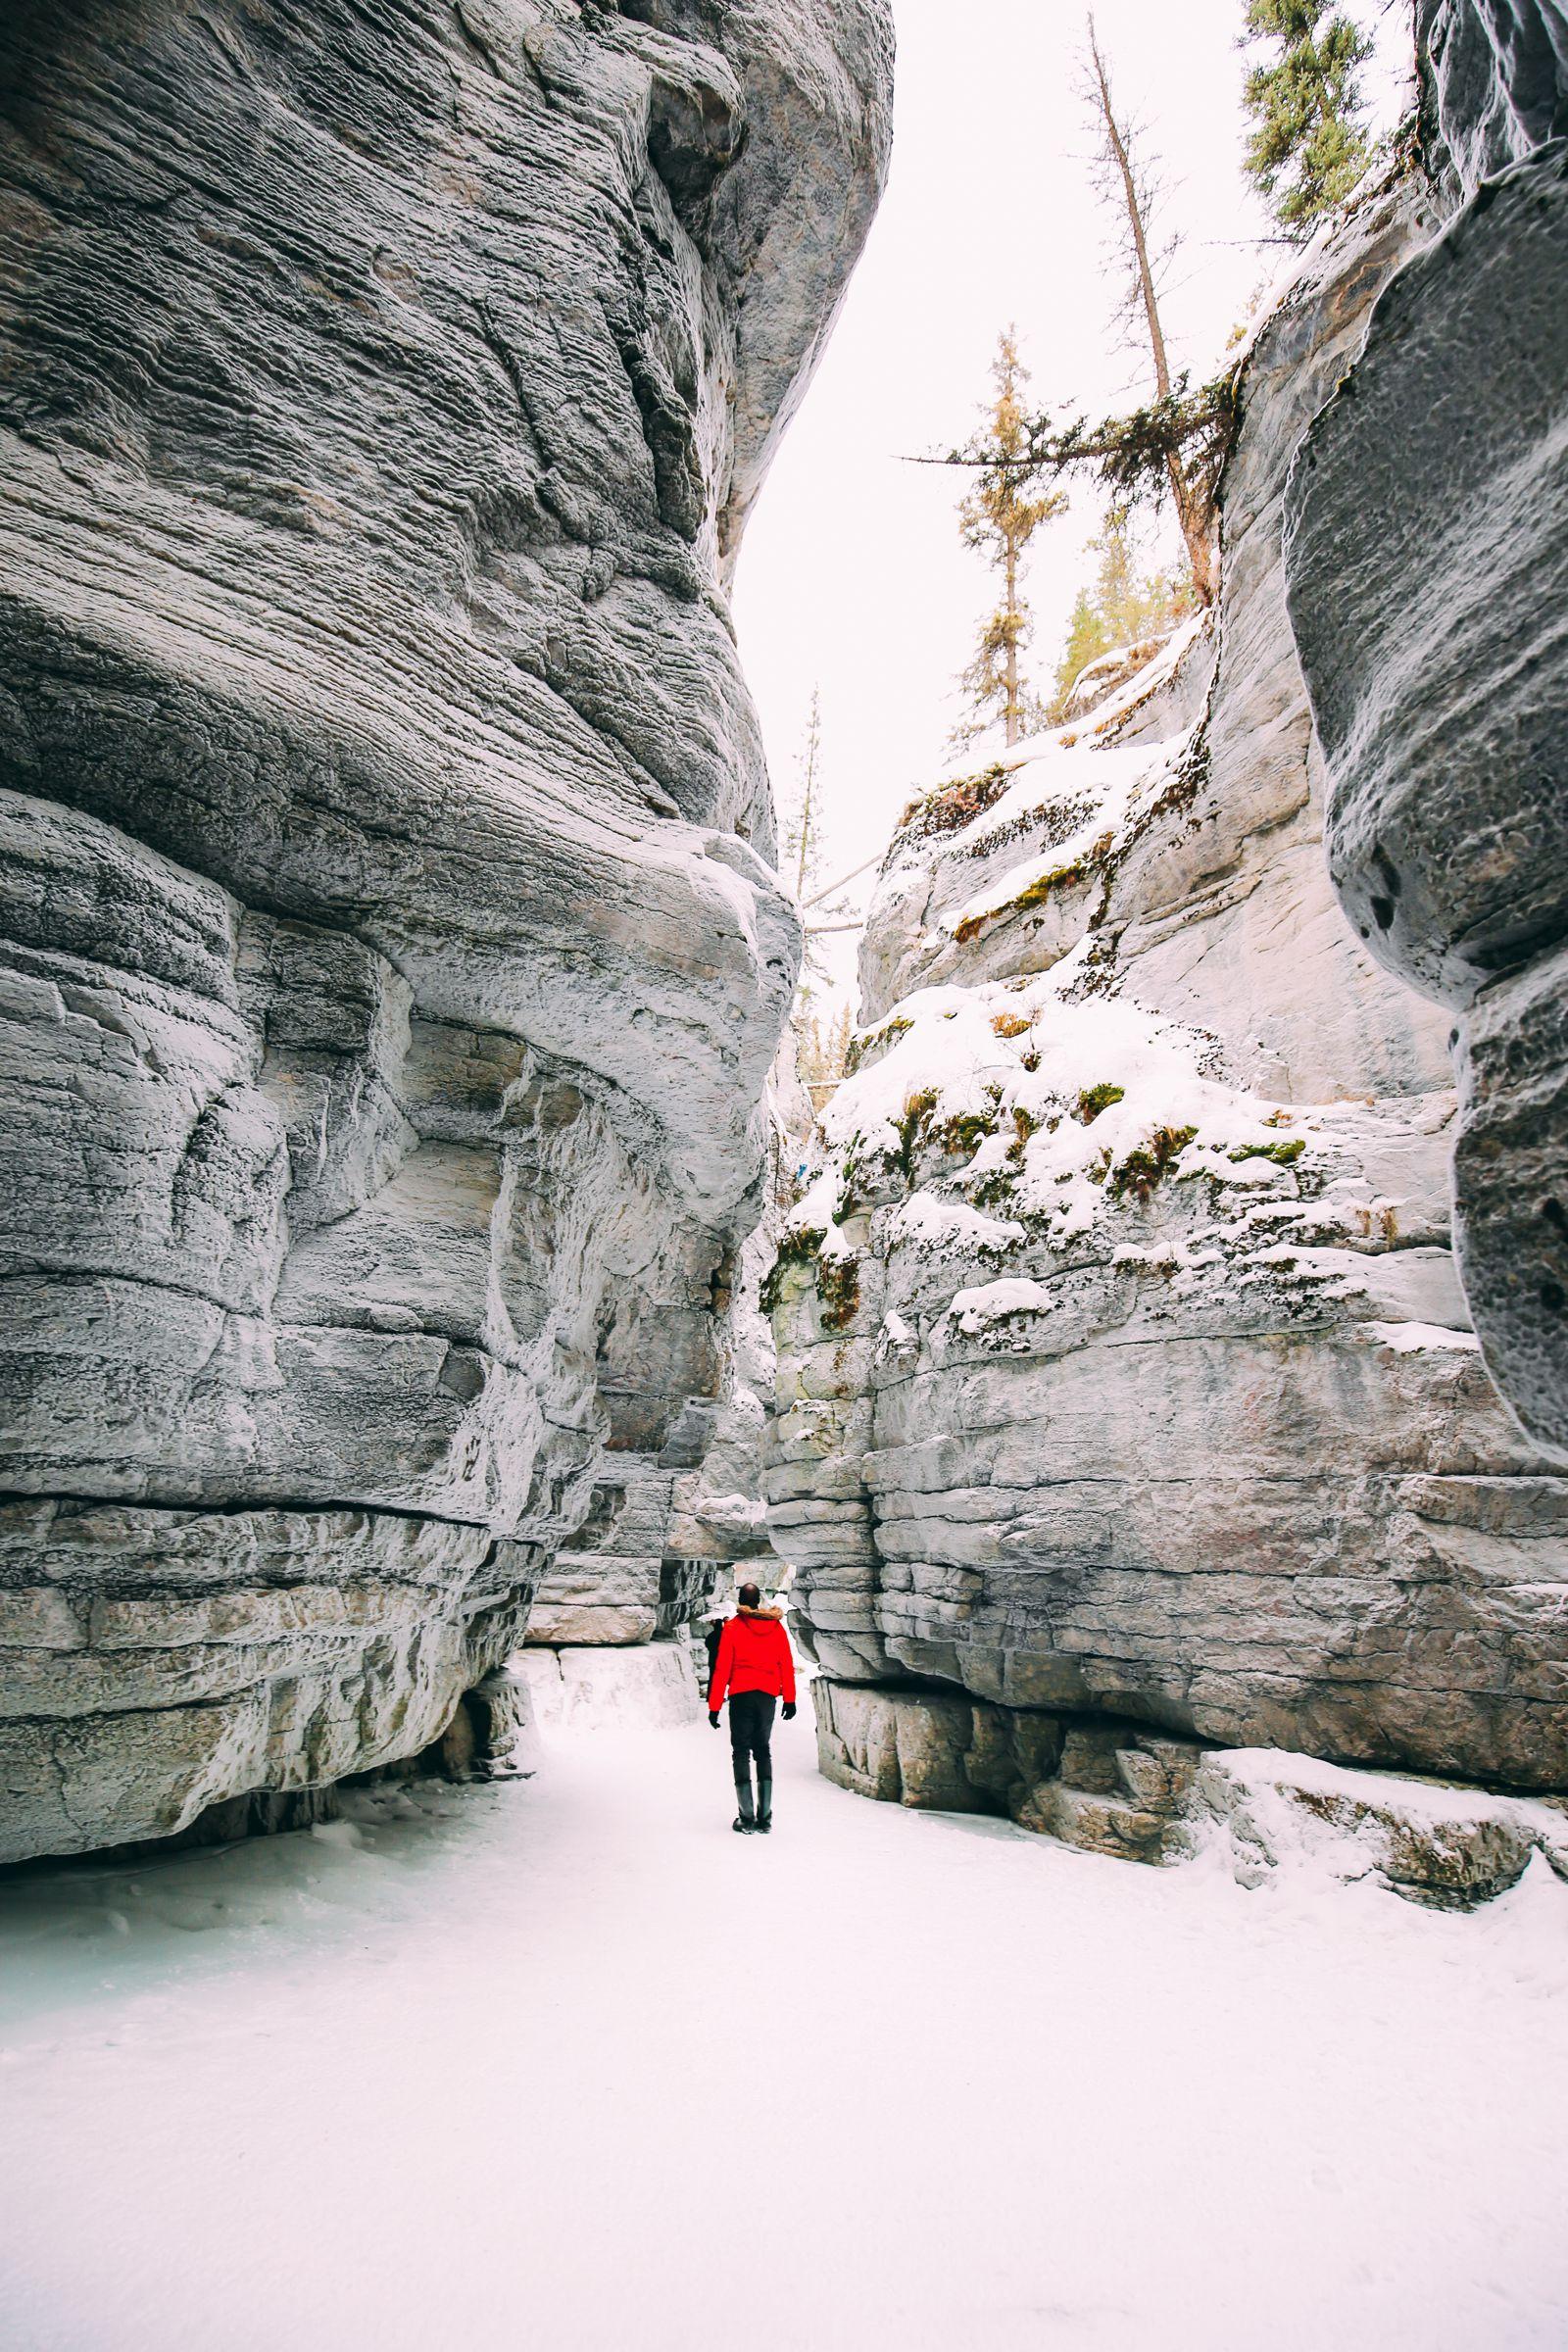 The Most Beautiful Place In Jasper (Canada) You've Never Heard Of! (25)